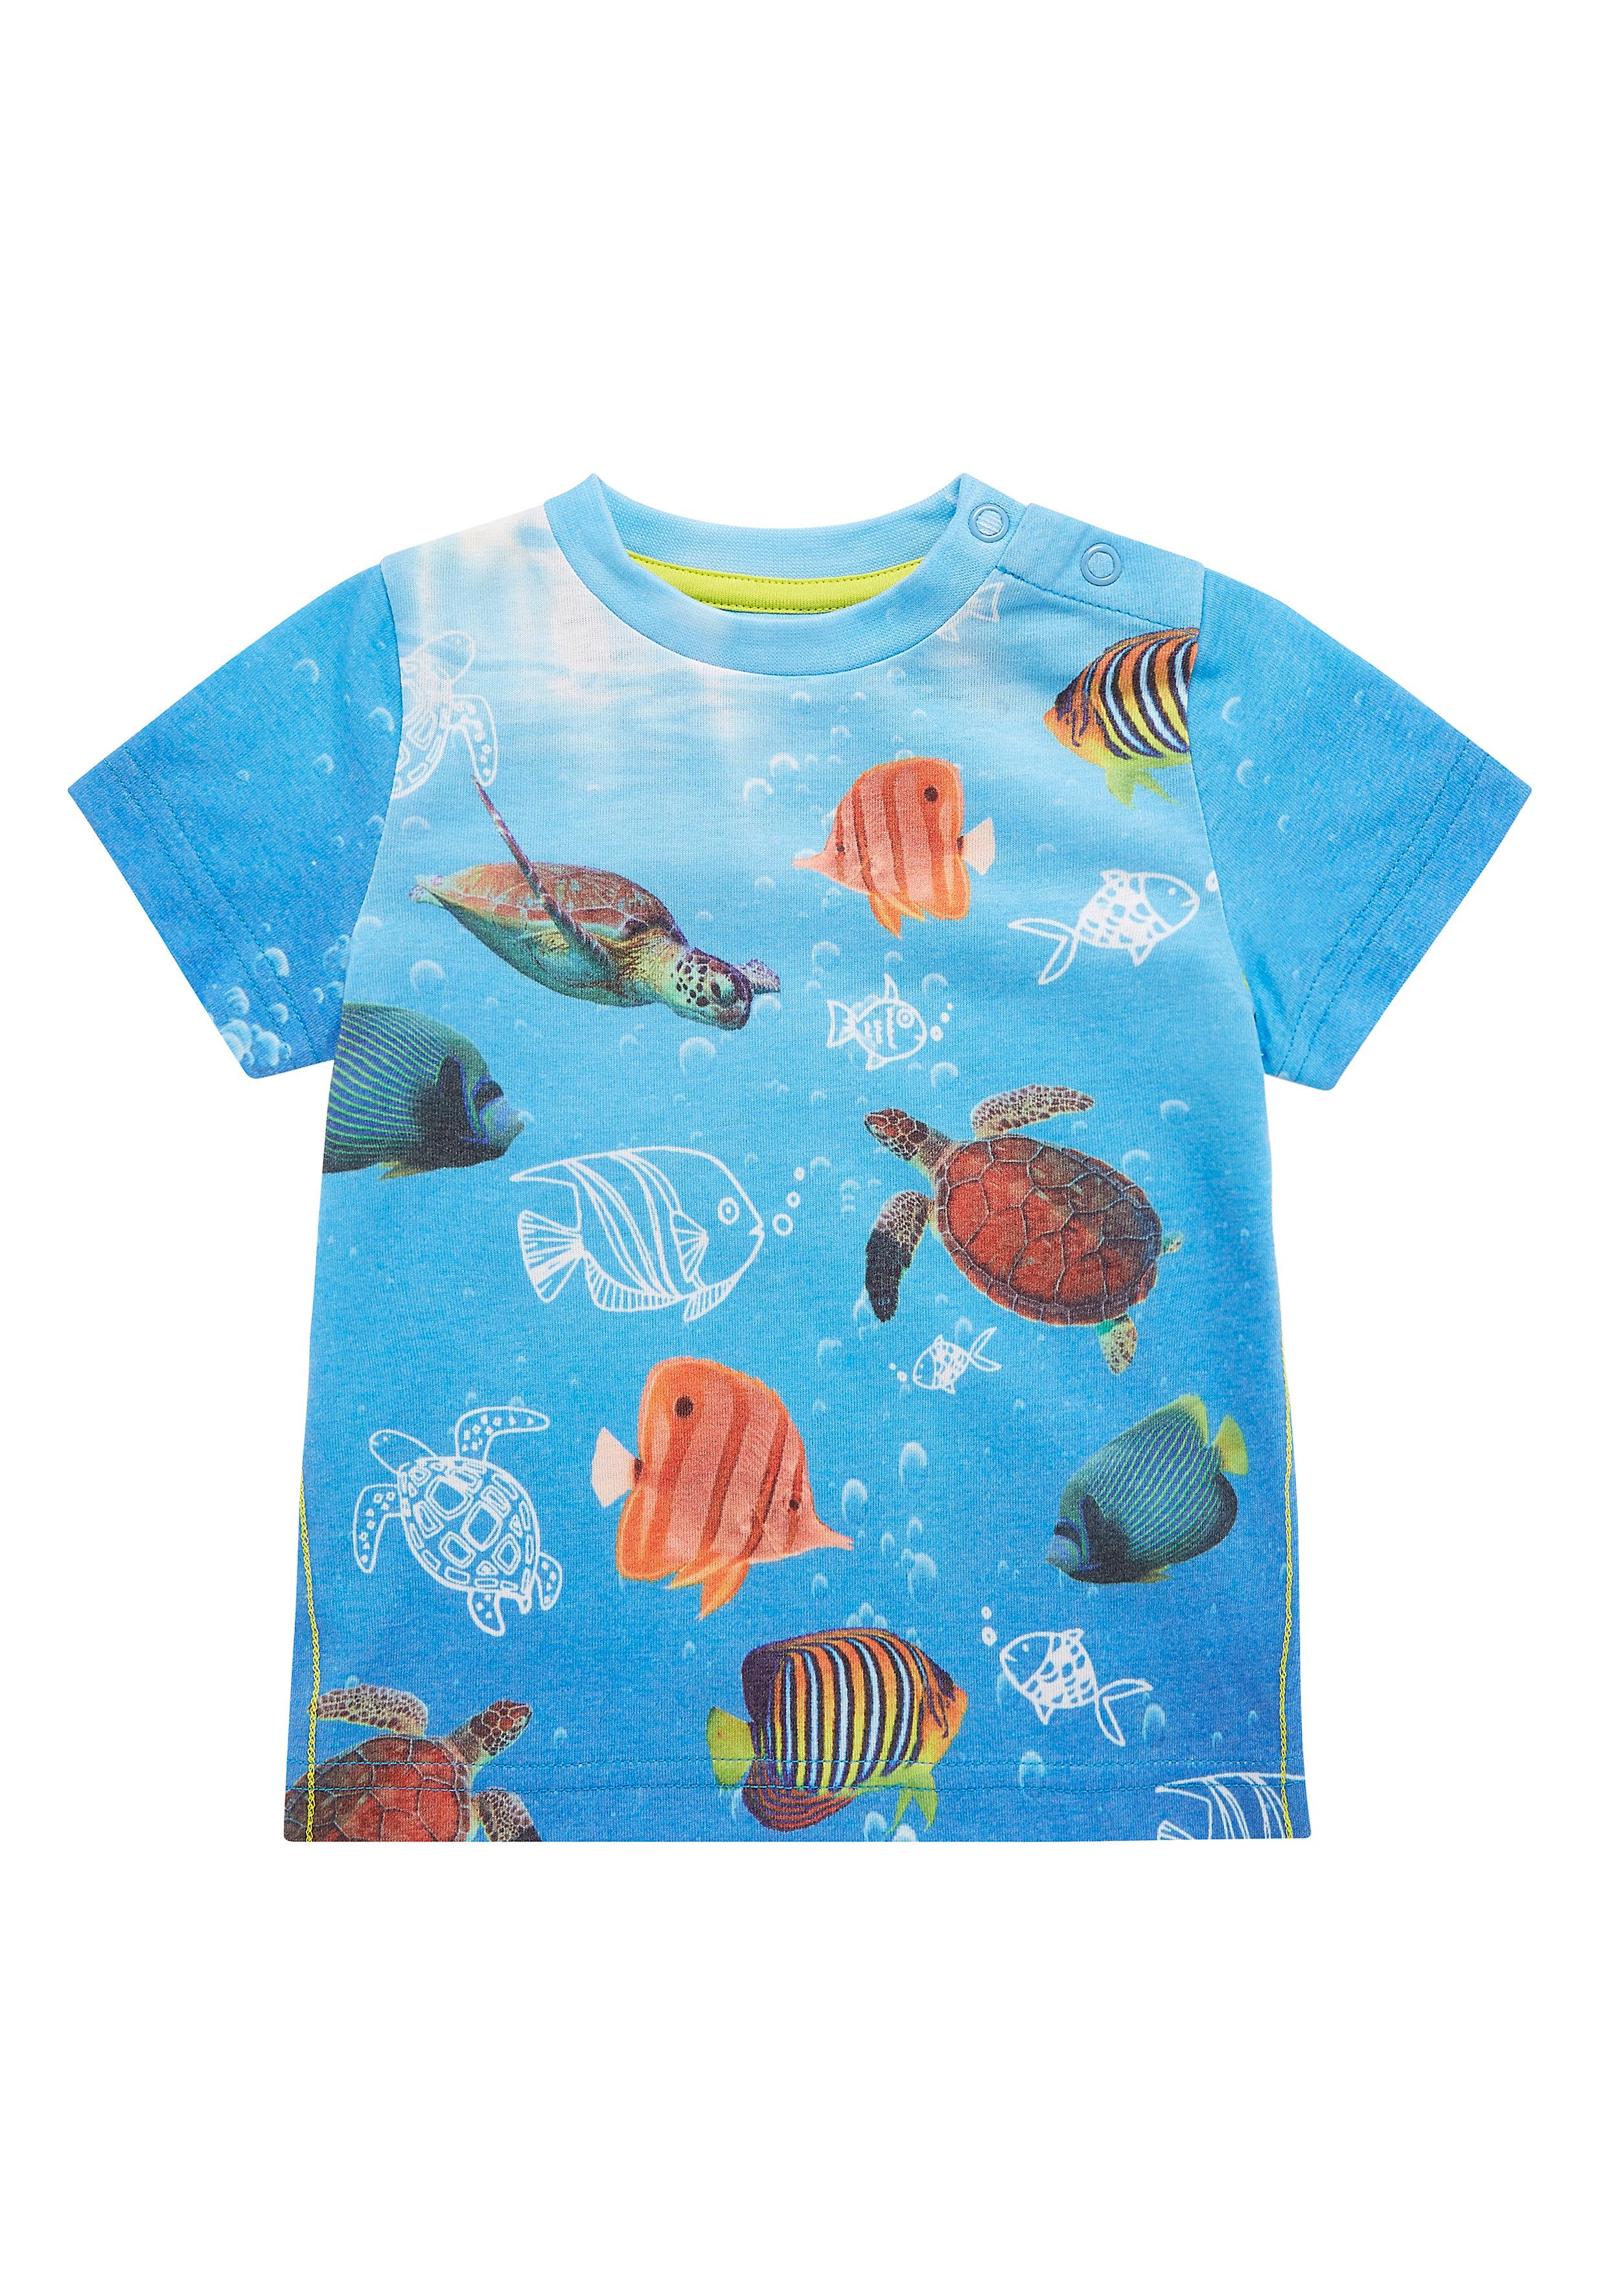 Mothercare | Boys Half Sleeves Ocean Print T-Shirt - Blue